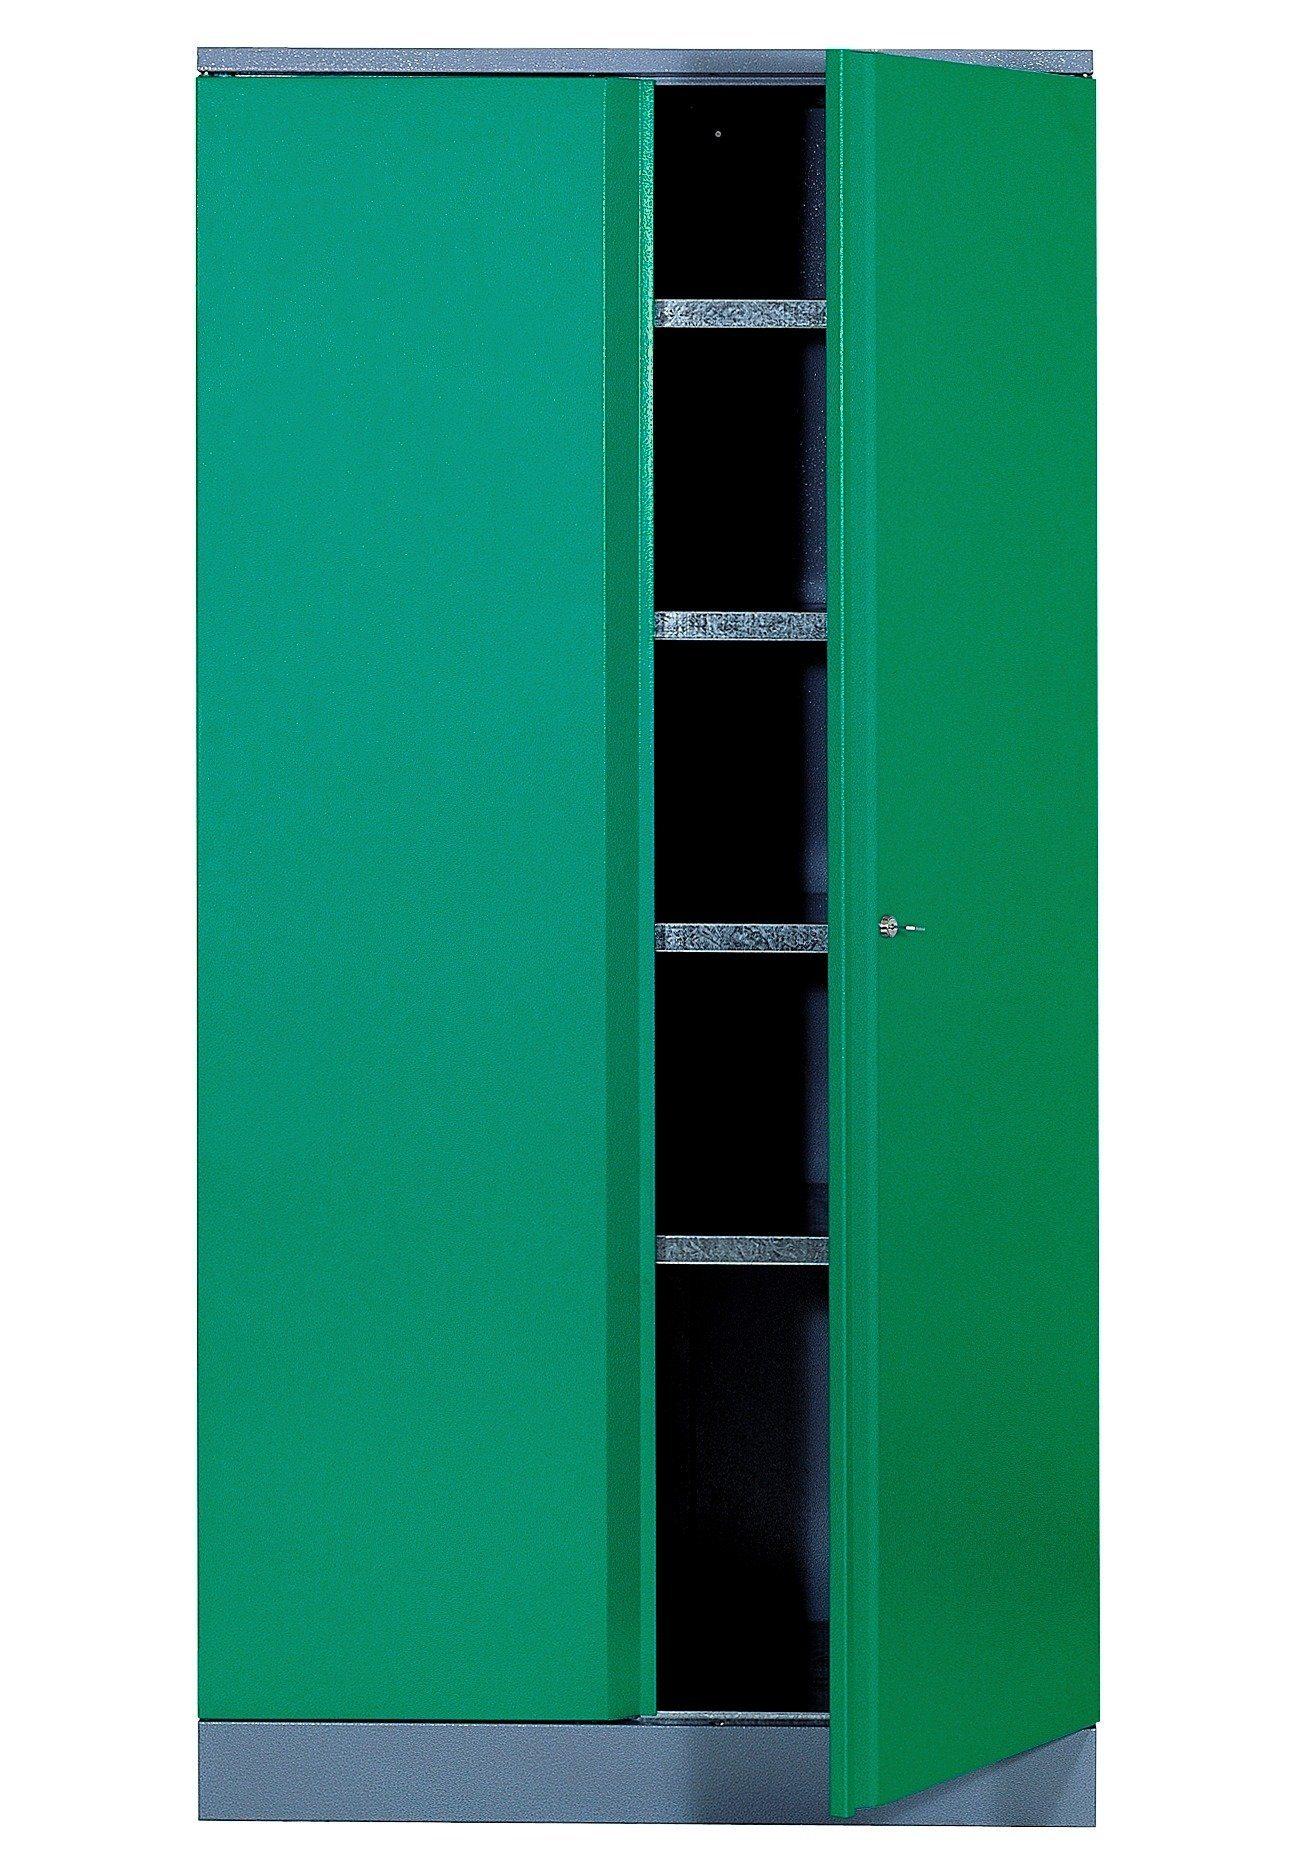 Küpper Hochschrank »2 Türen, 4 Einlegeböden, in grün«